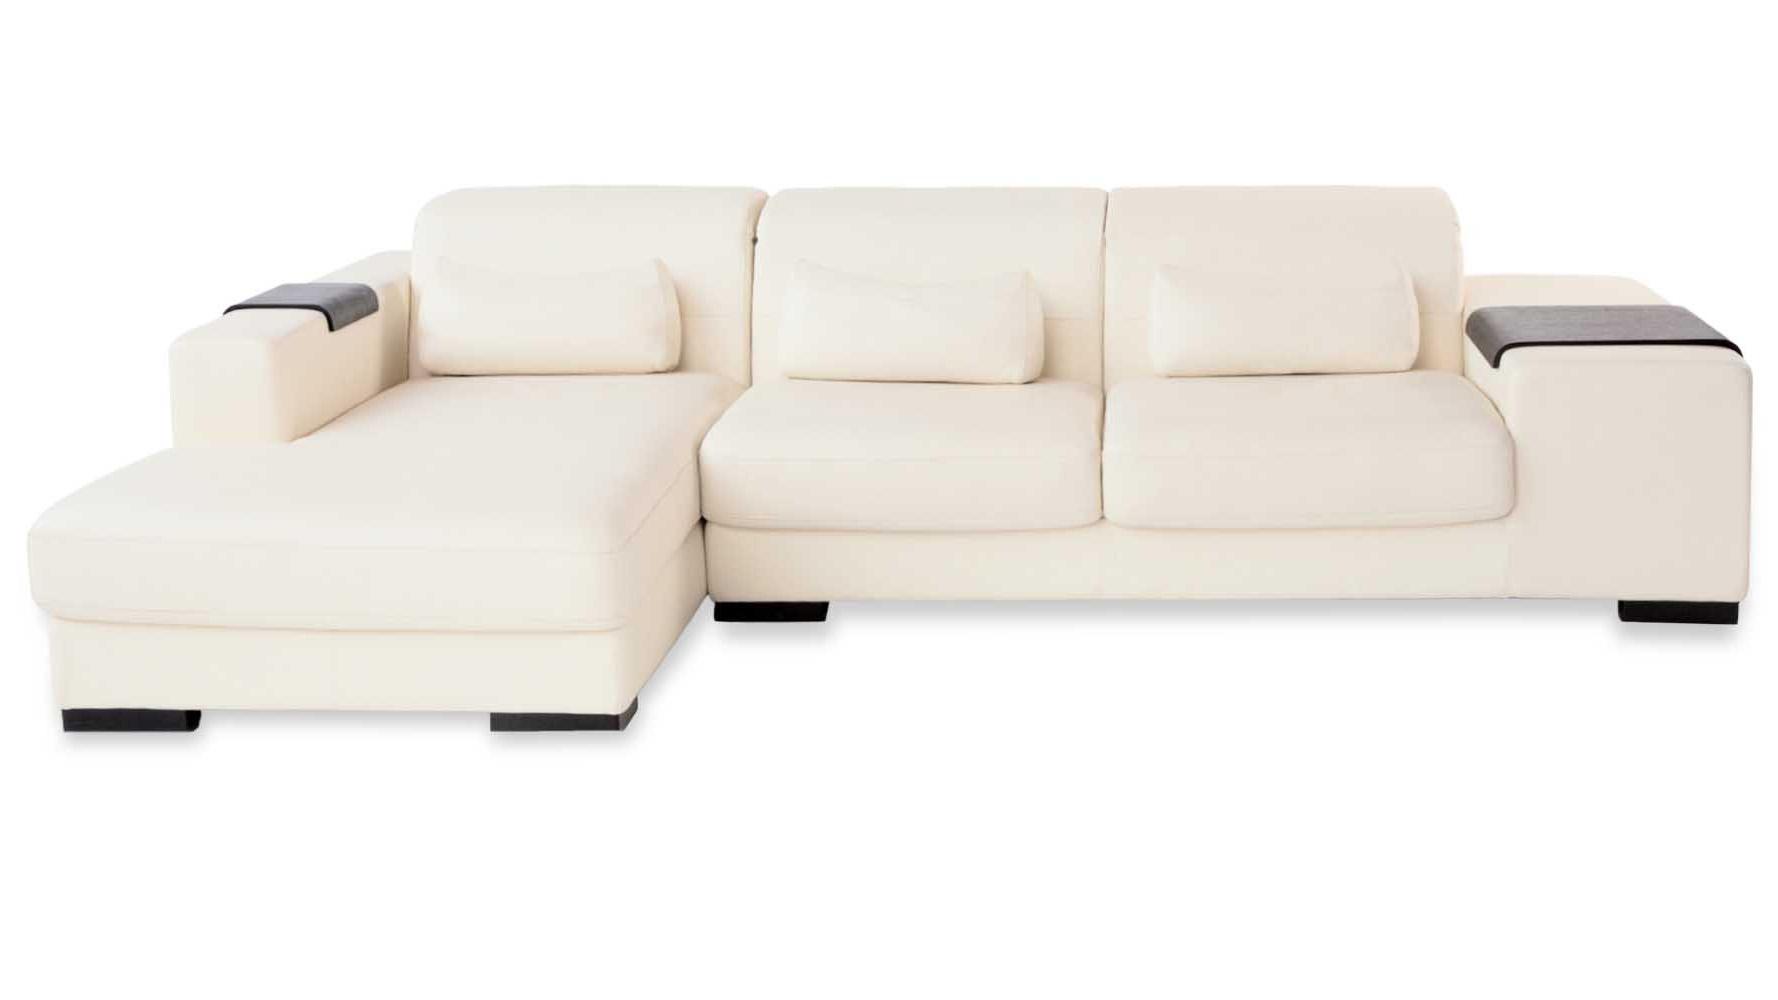 Kings Brand Sky Chocolate Microfiber Sofa & Love Seat Living Room Set